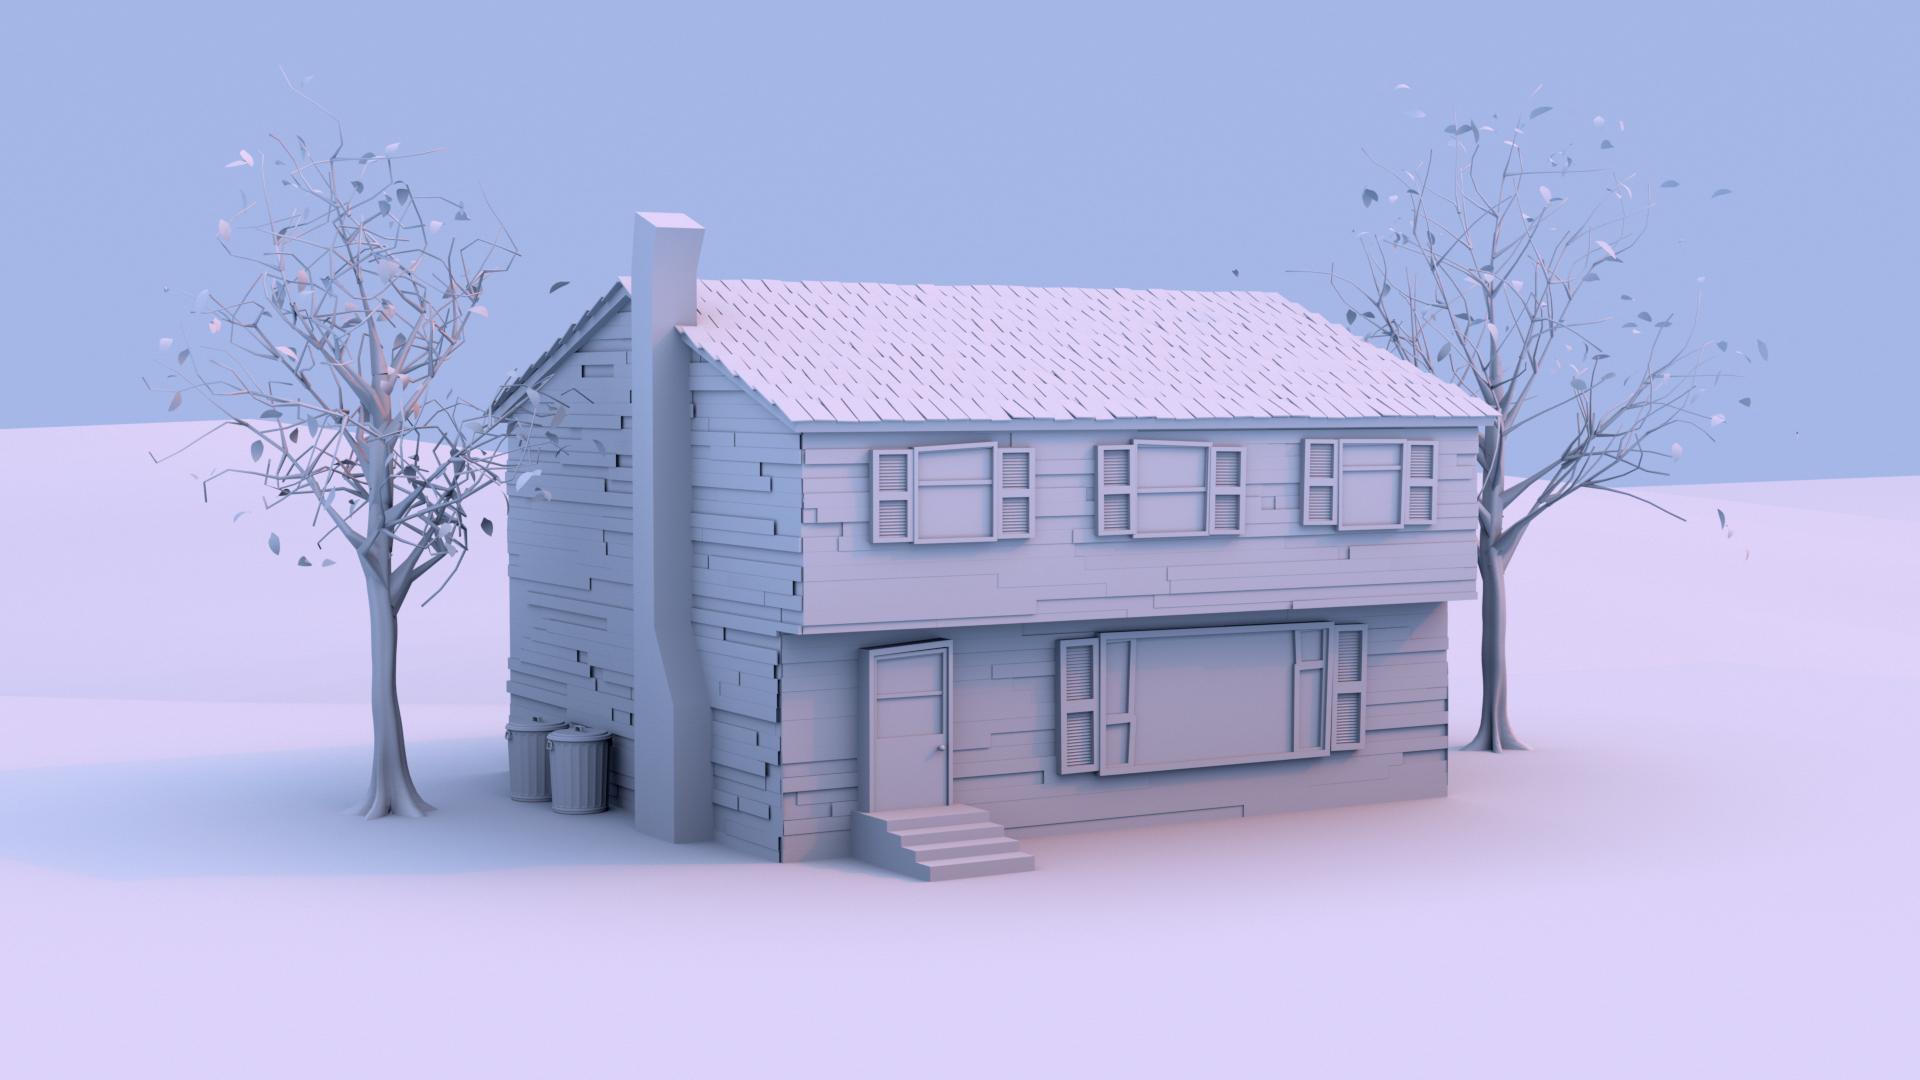 House_1_v1a_edit